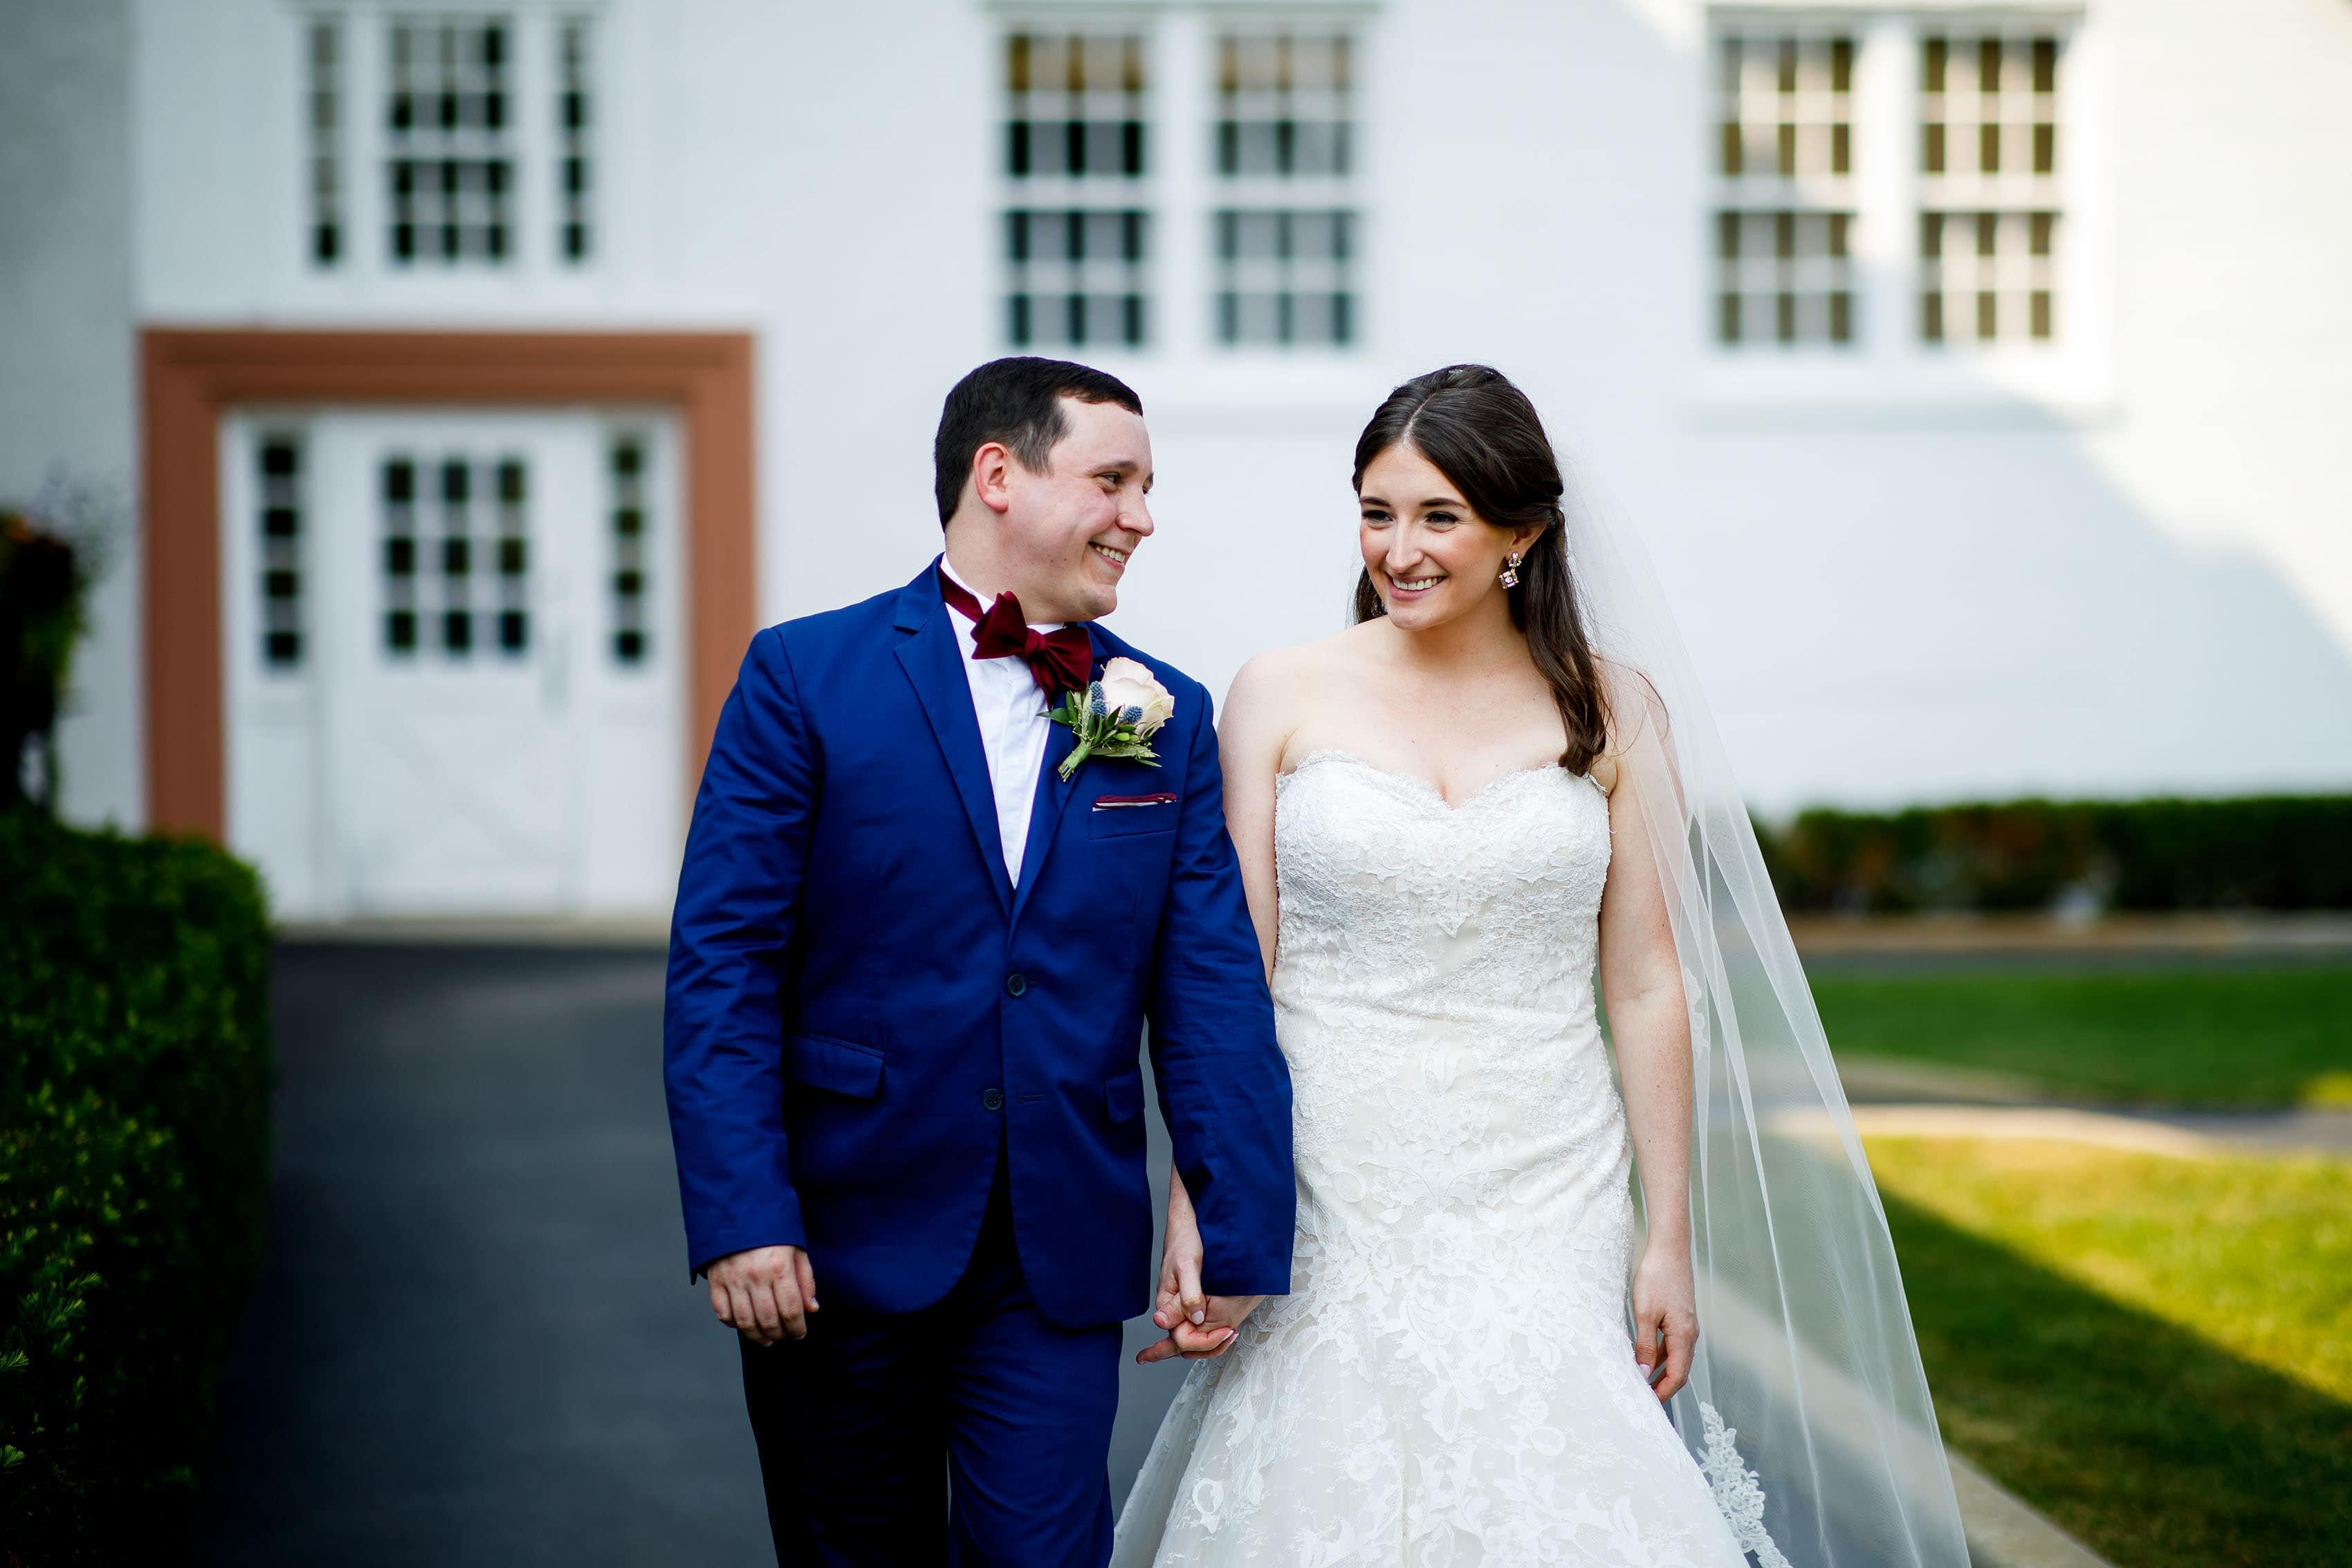 Katie and Joel walk together